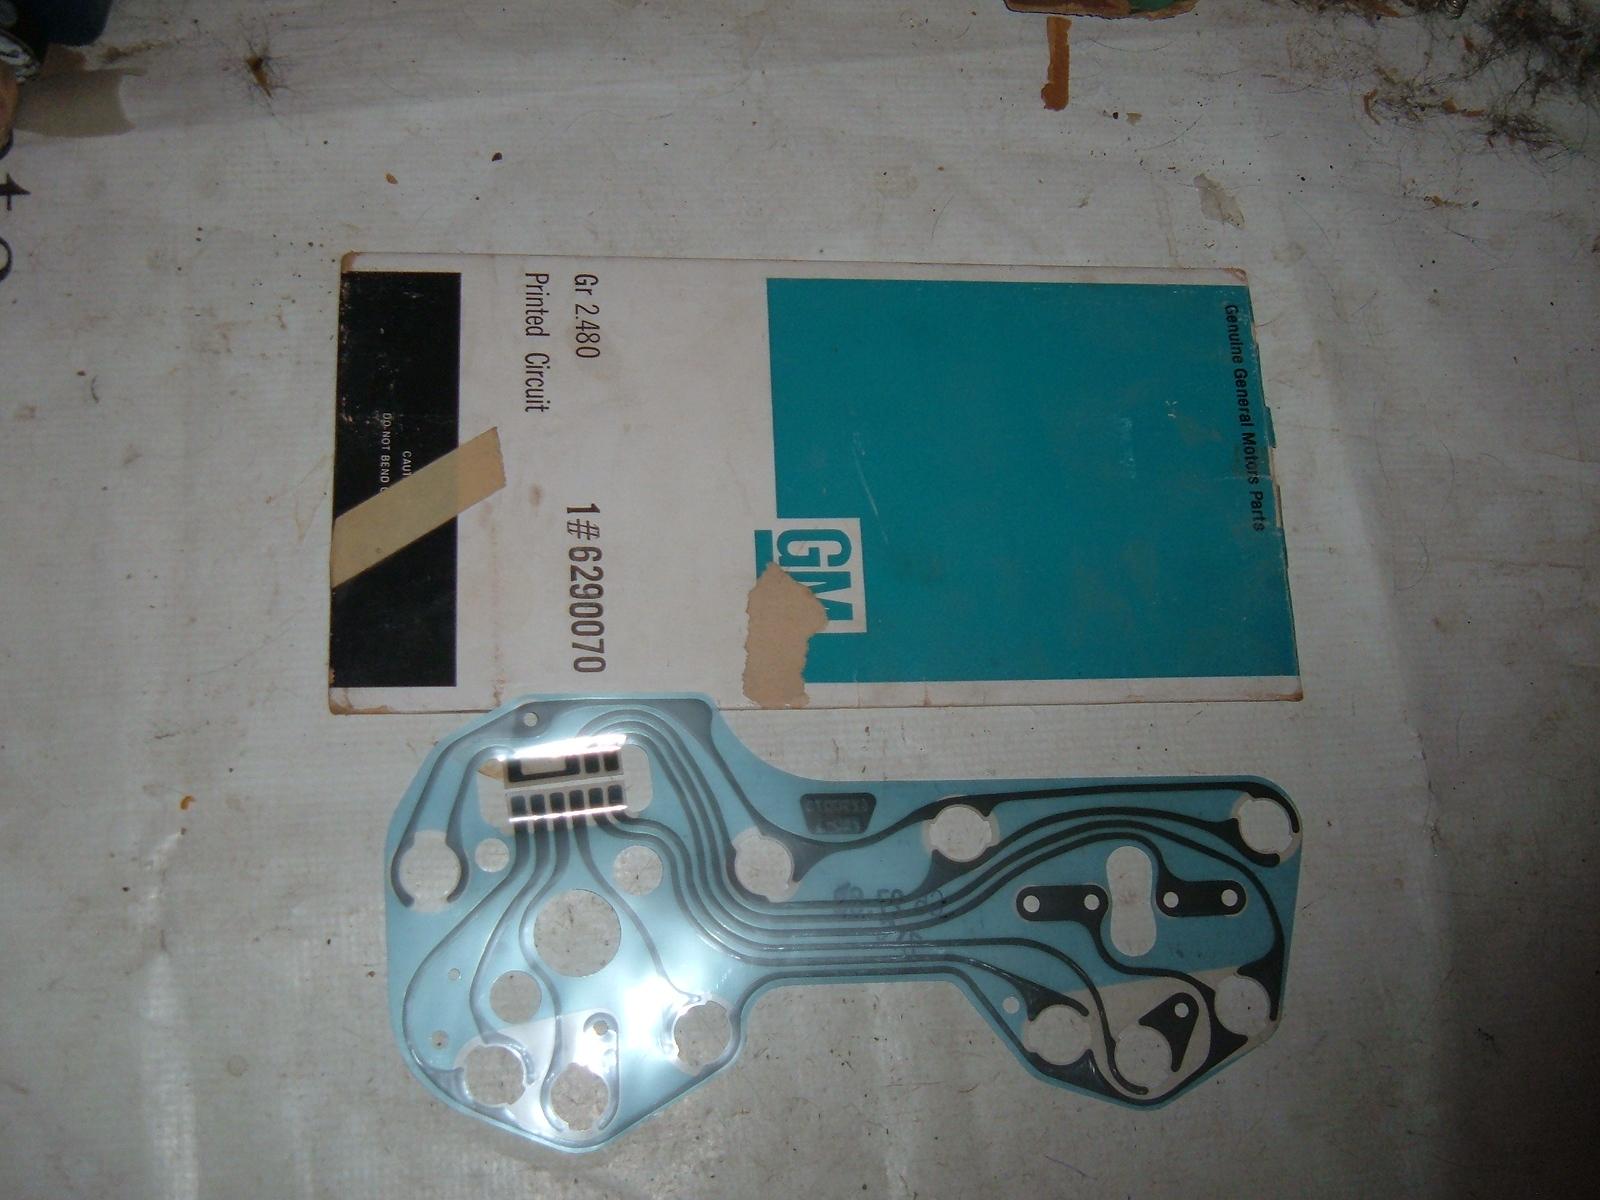 Gauges Clocks Firebird Instrument Cluster Circuit Board For Cars With Warning 1967 68 Camaro Printed Dash Nos Gm 6290070